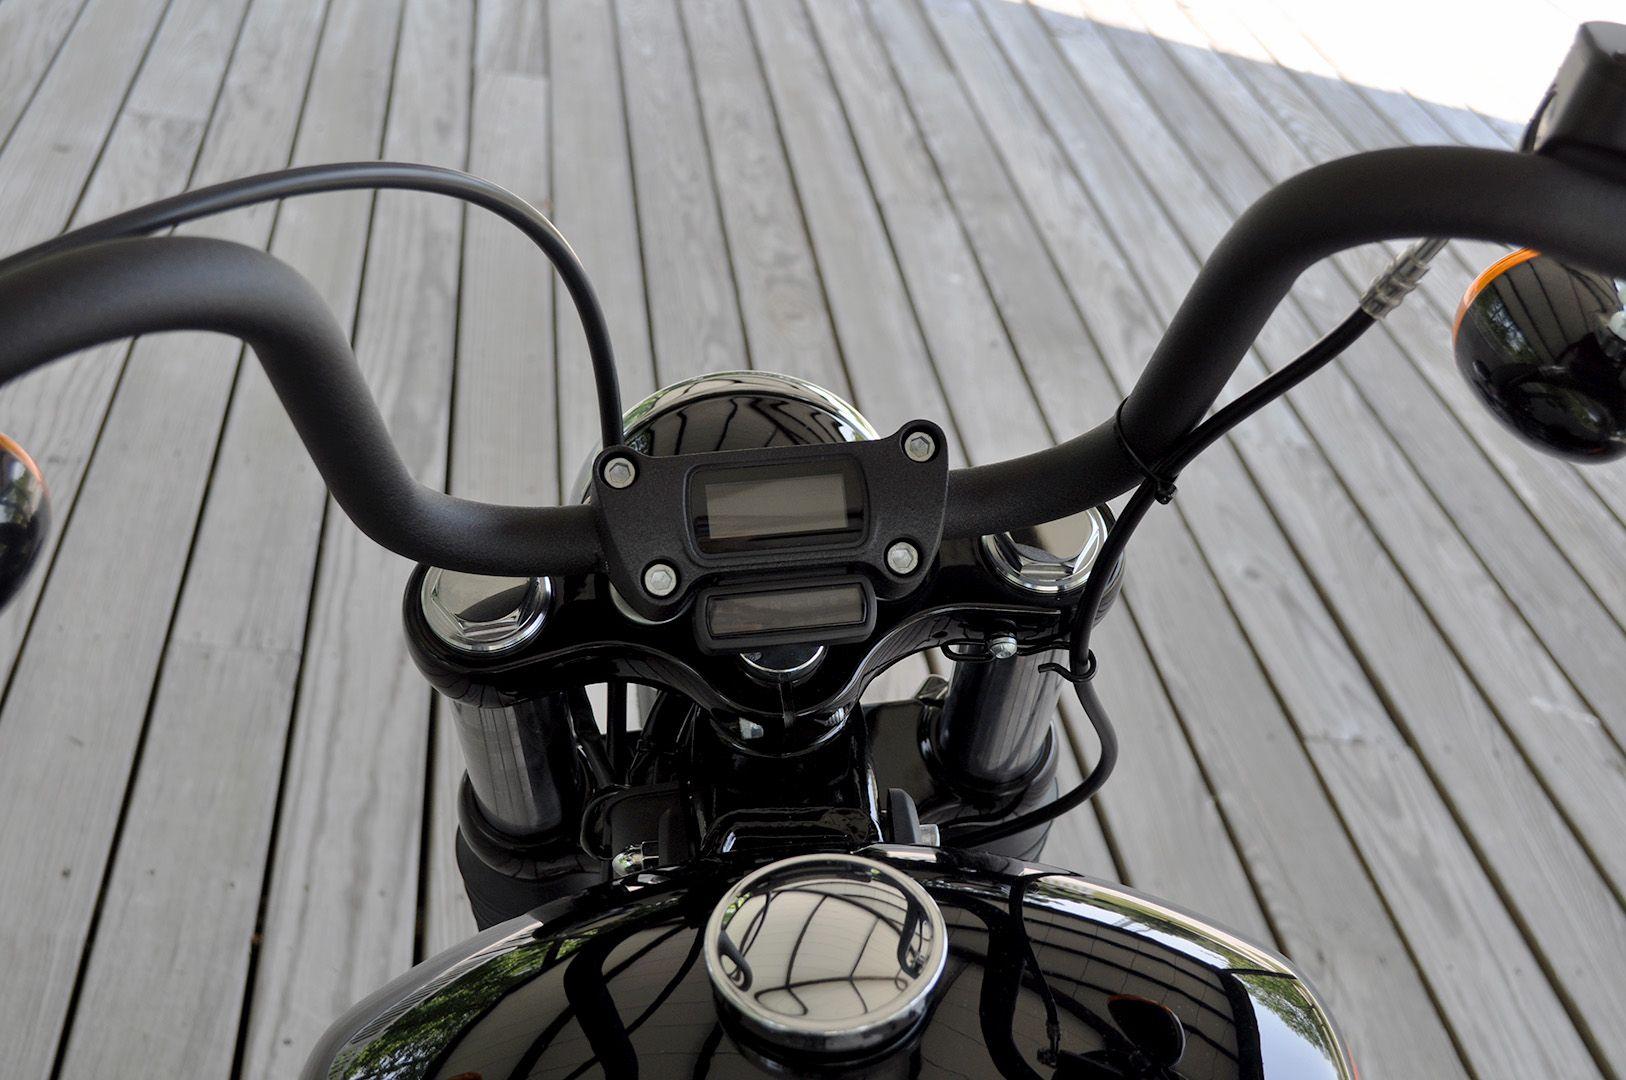 New 2021 Harley-Davidson Street Bob 114